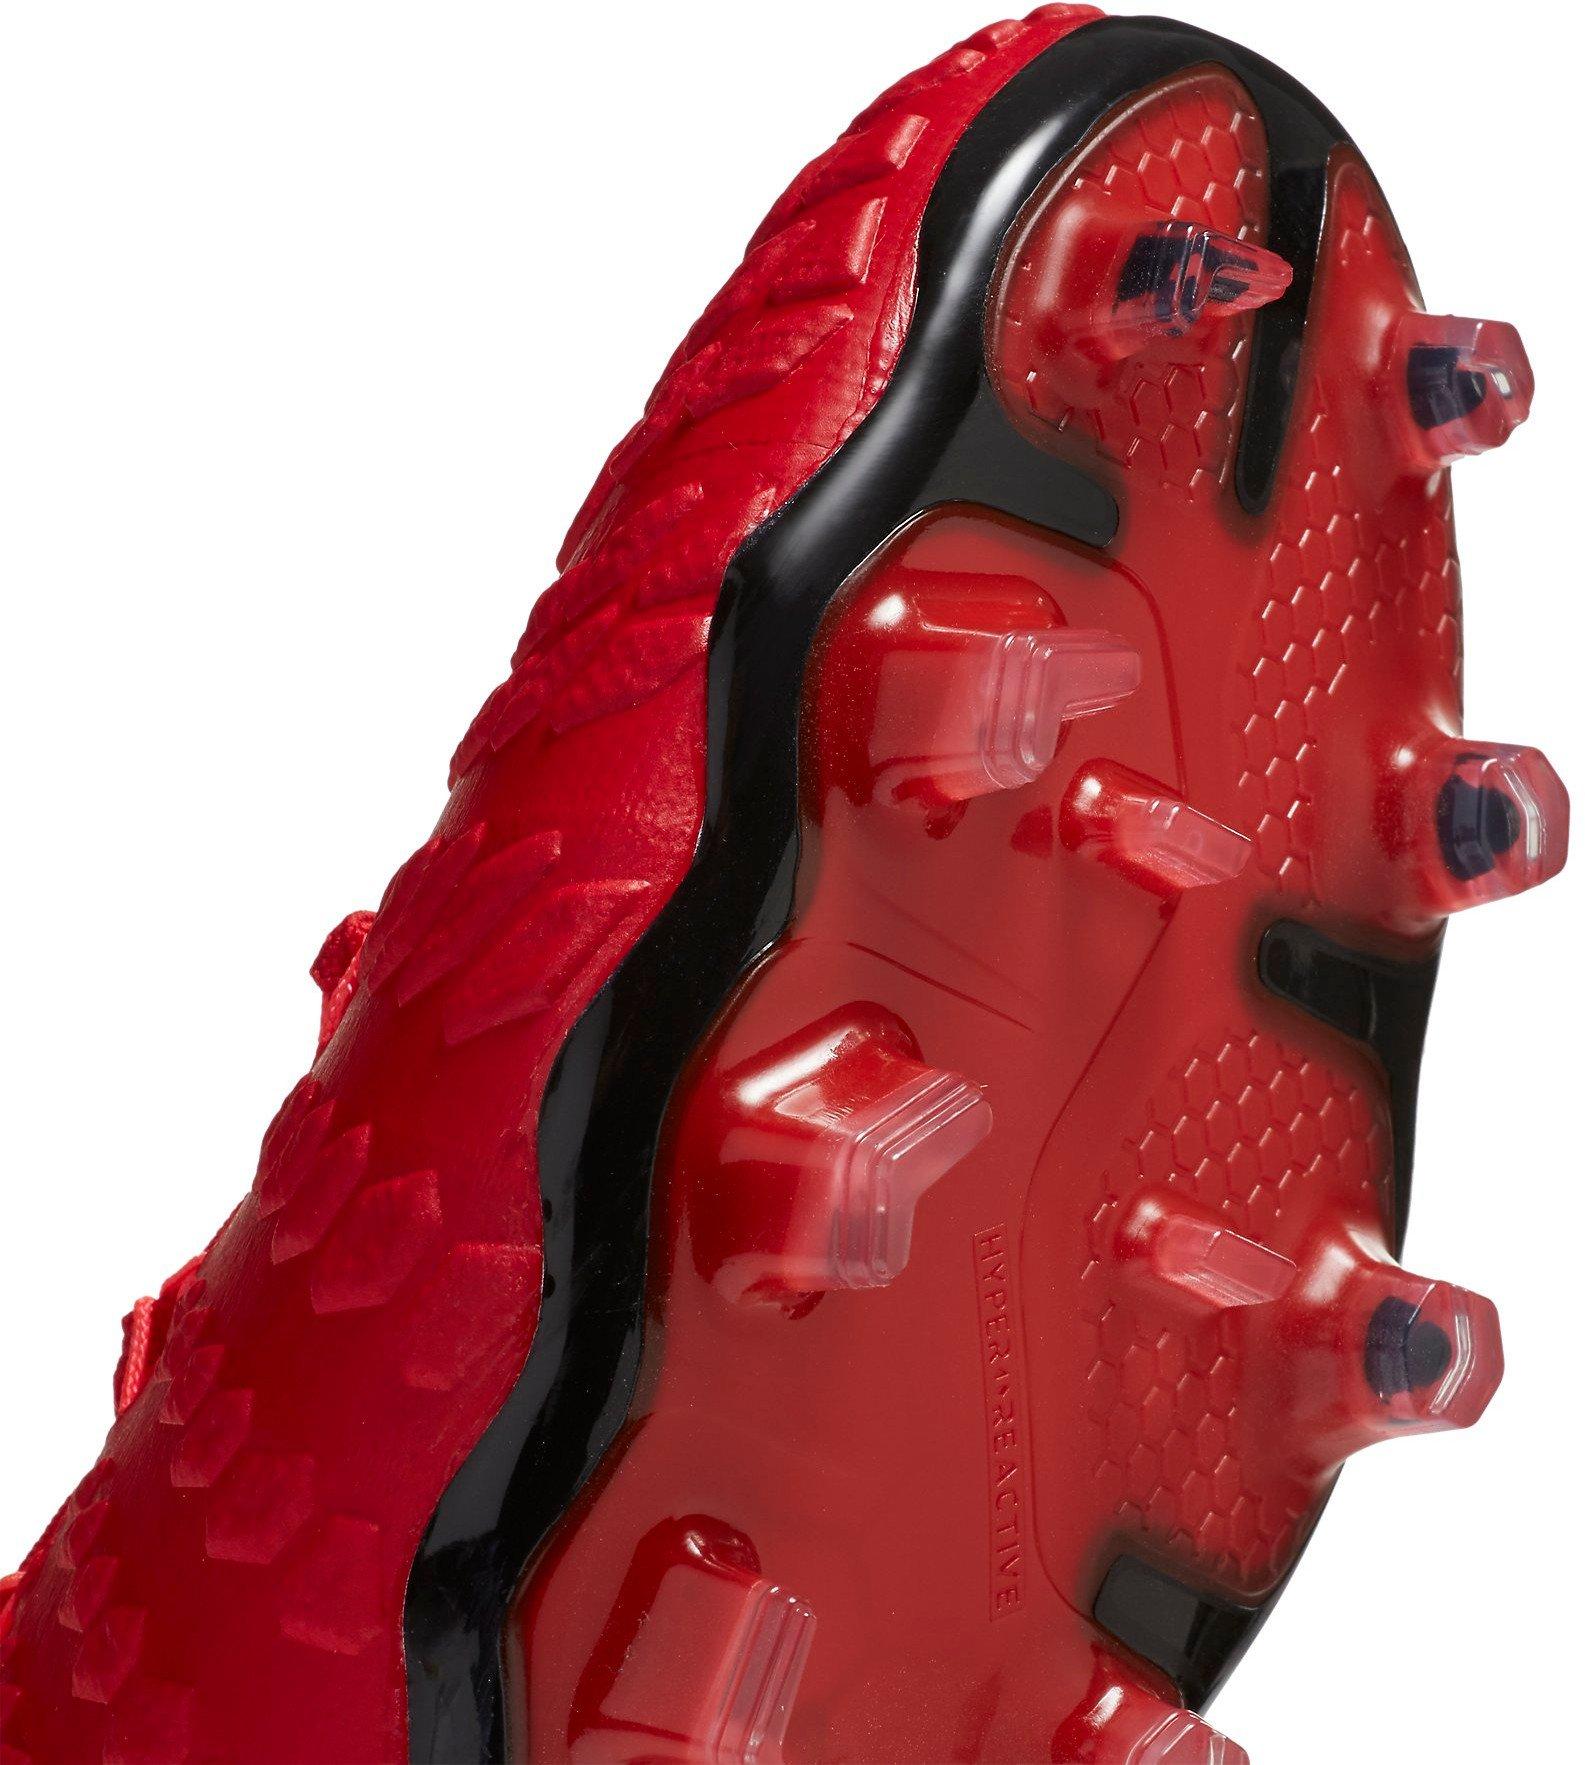 Zapatos de futbol Profesional de Hombre Nike Hypervenom Phantom III Fg rojo